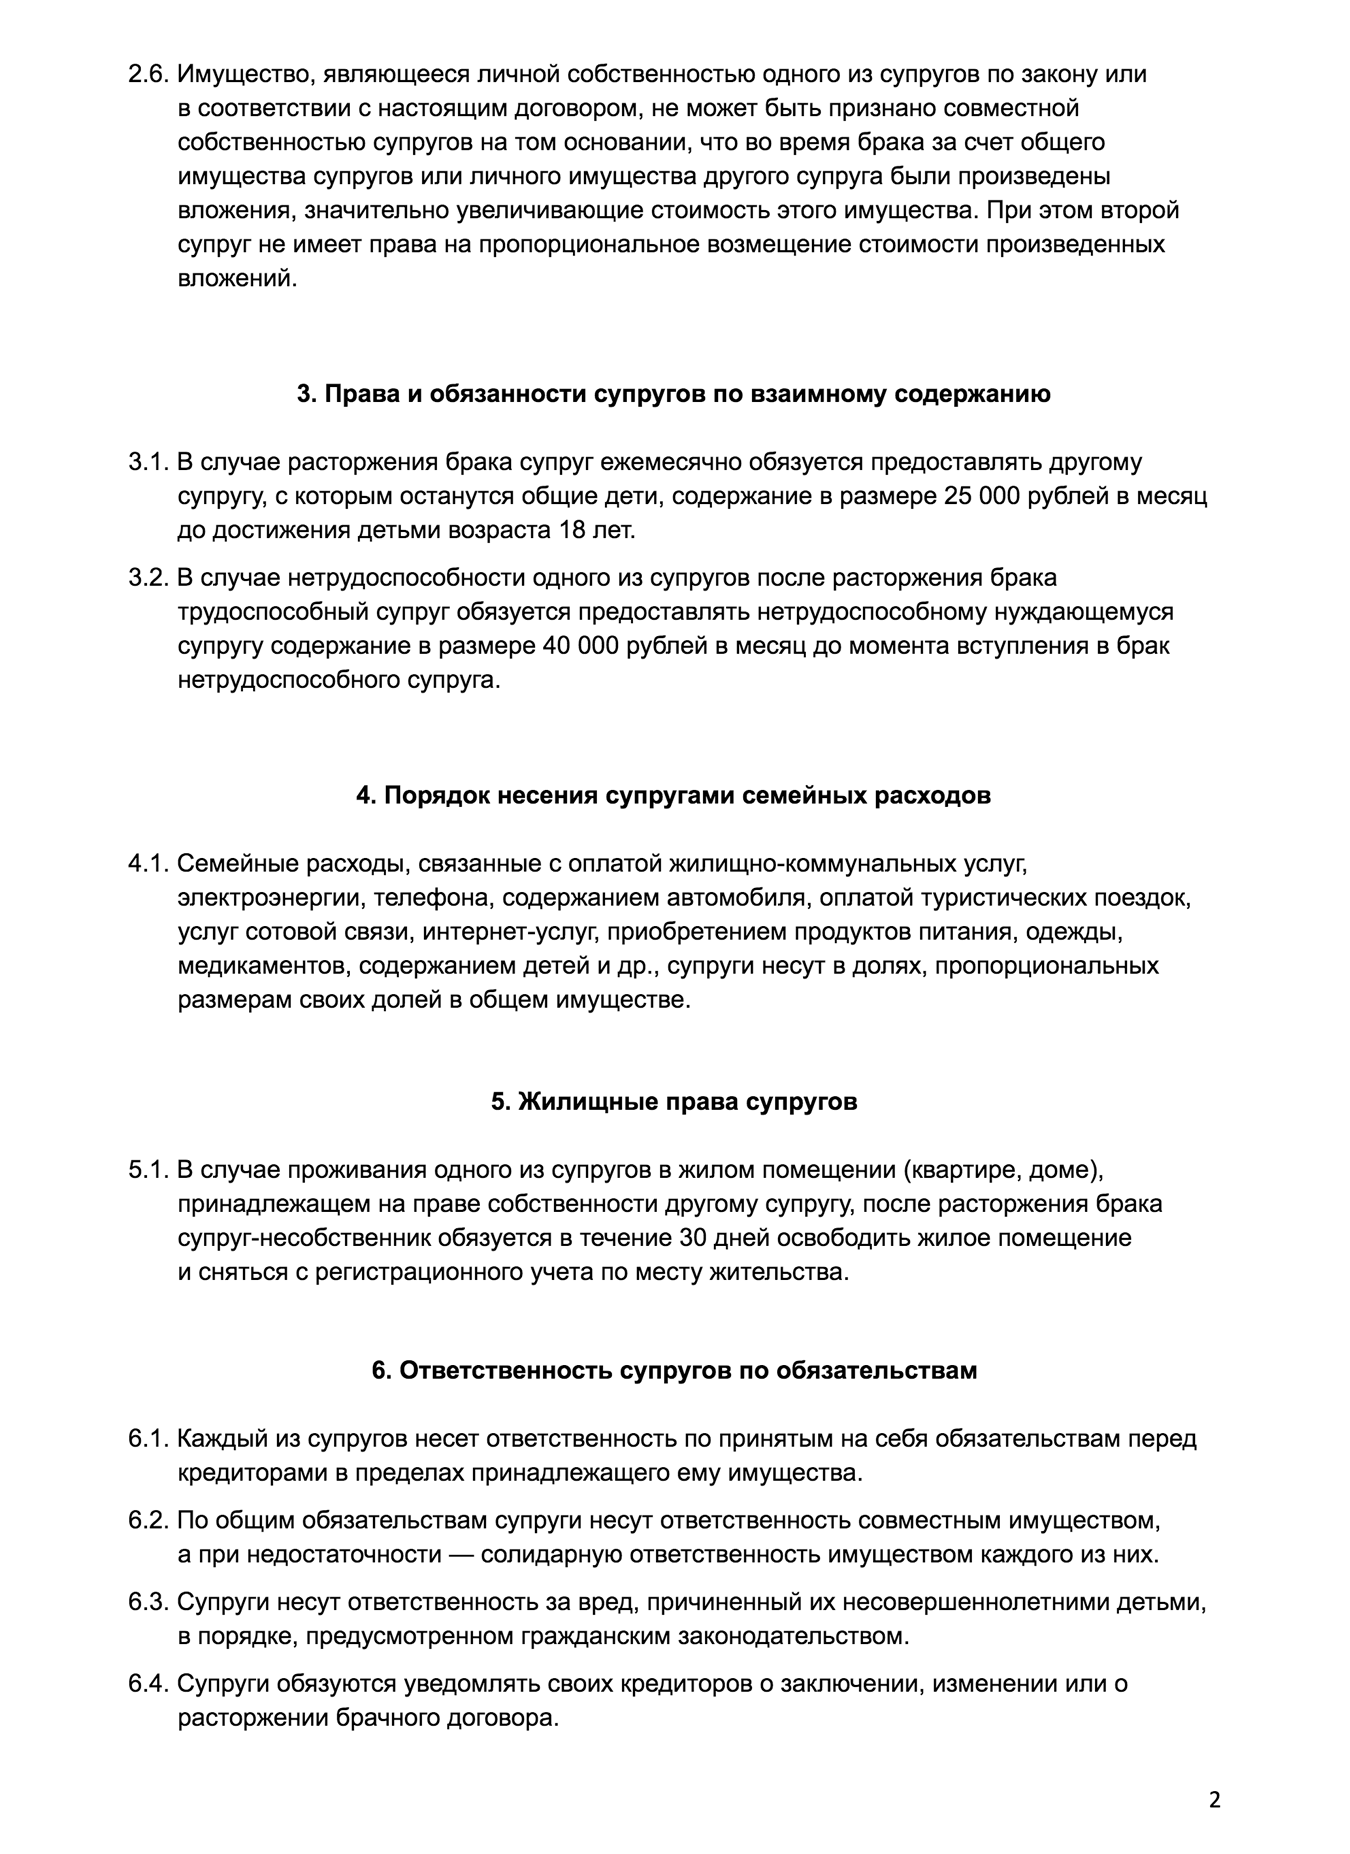 Брачный контракт: плюсы и минусы